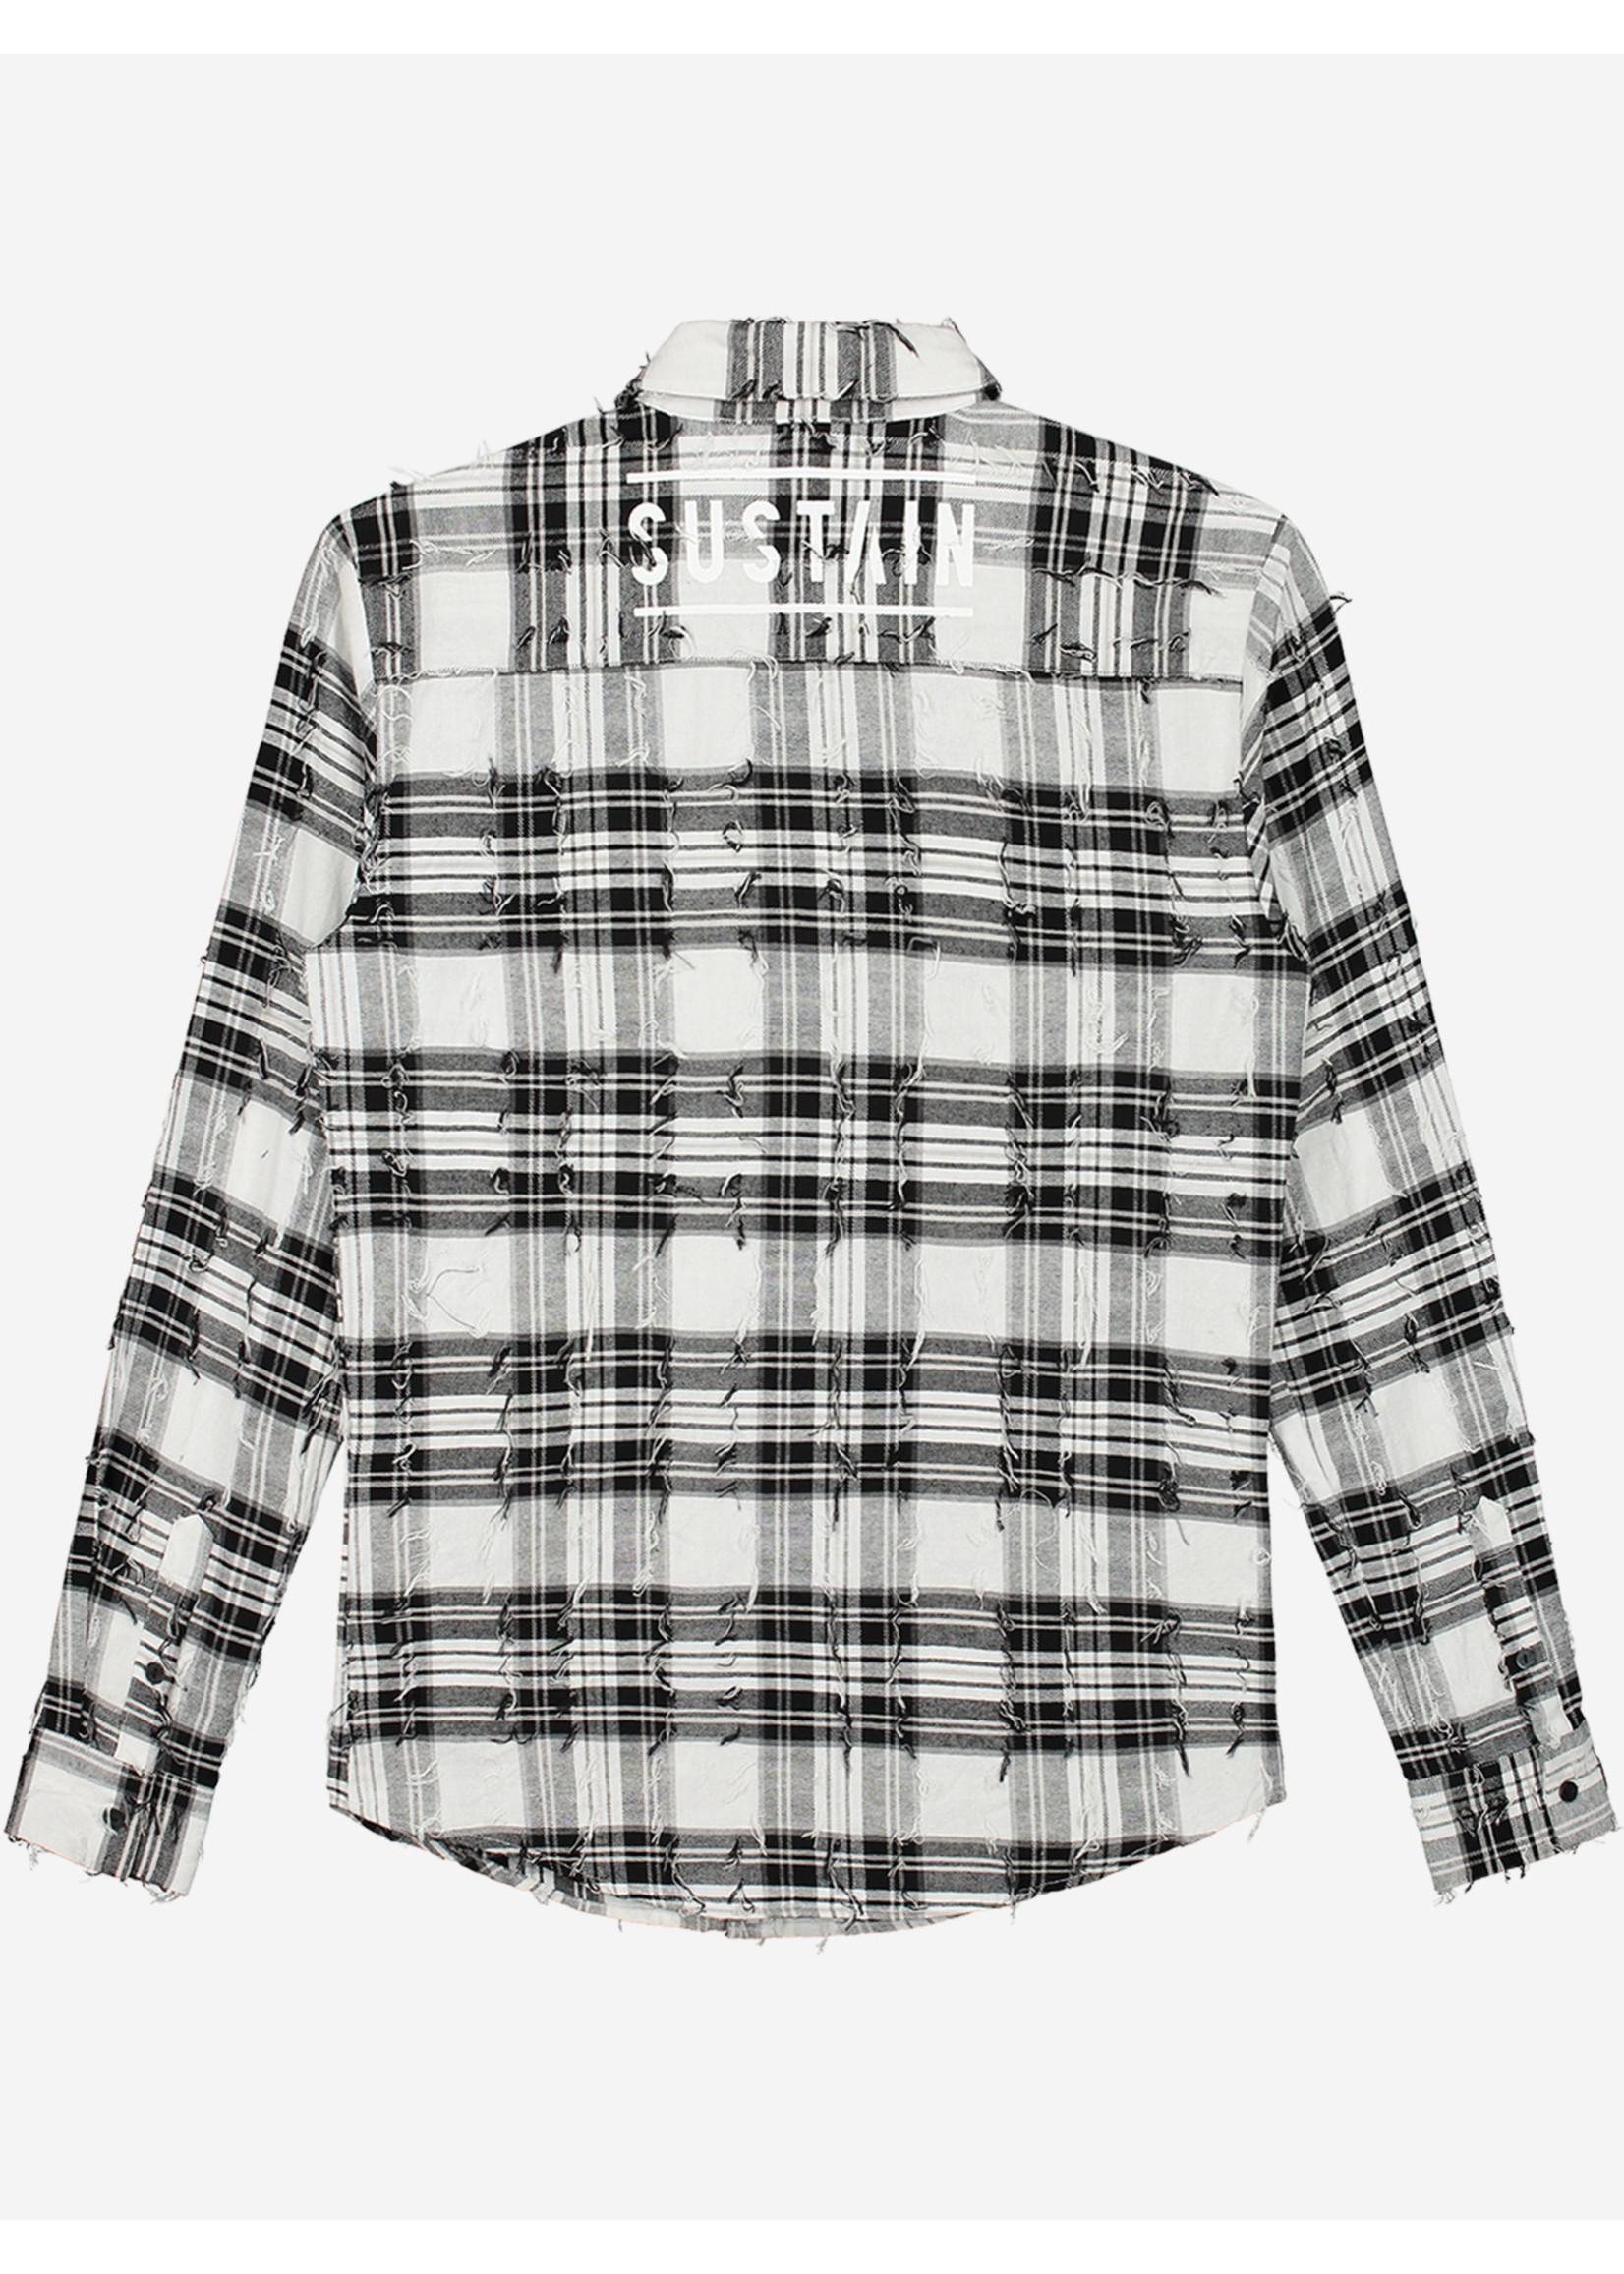 Sustain Sustain  Check Logo Shirt - Black/White